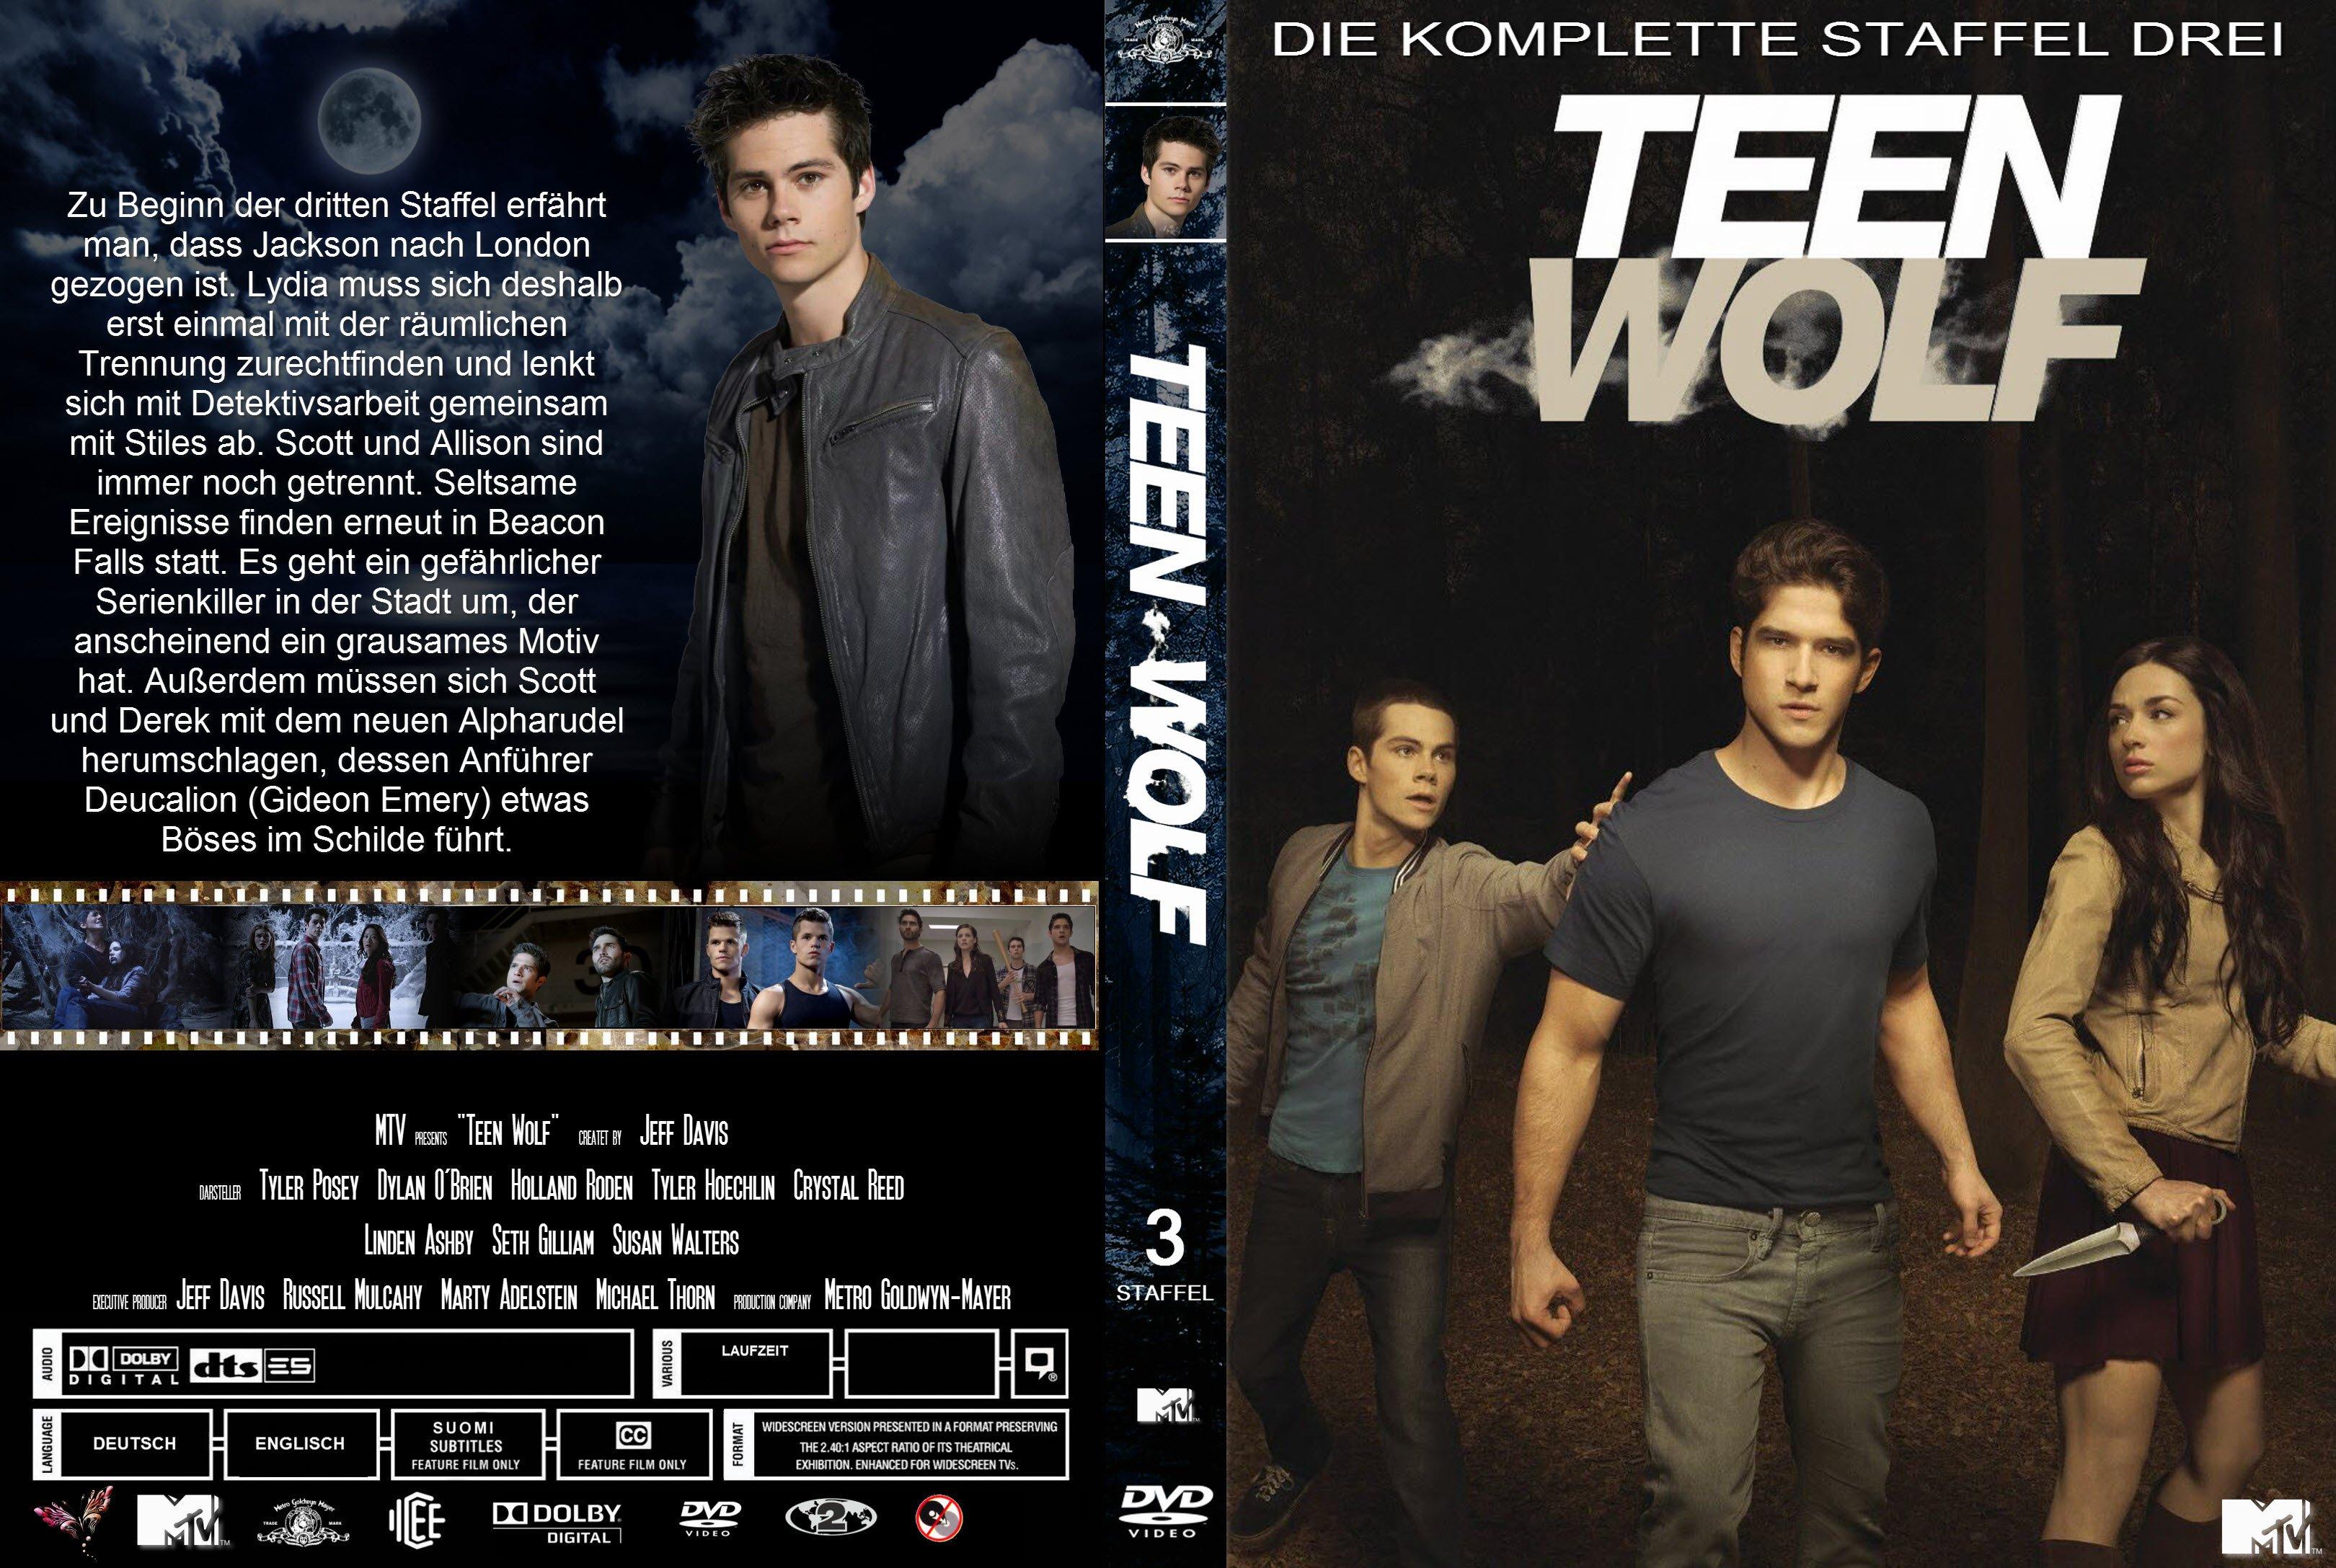 Teen Wolf Staffel3